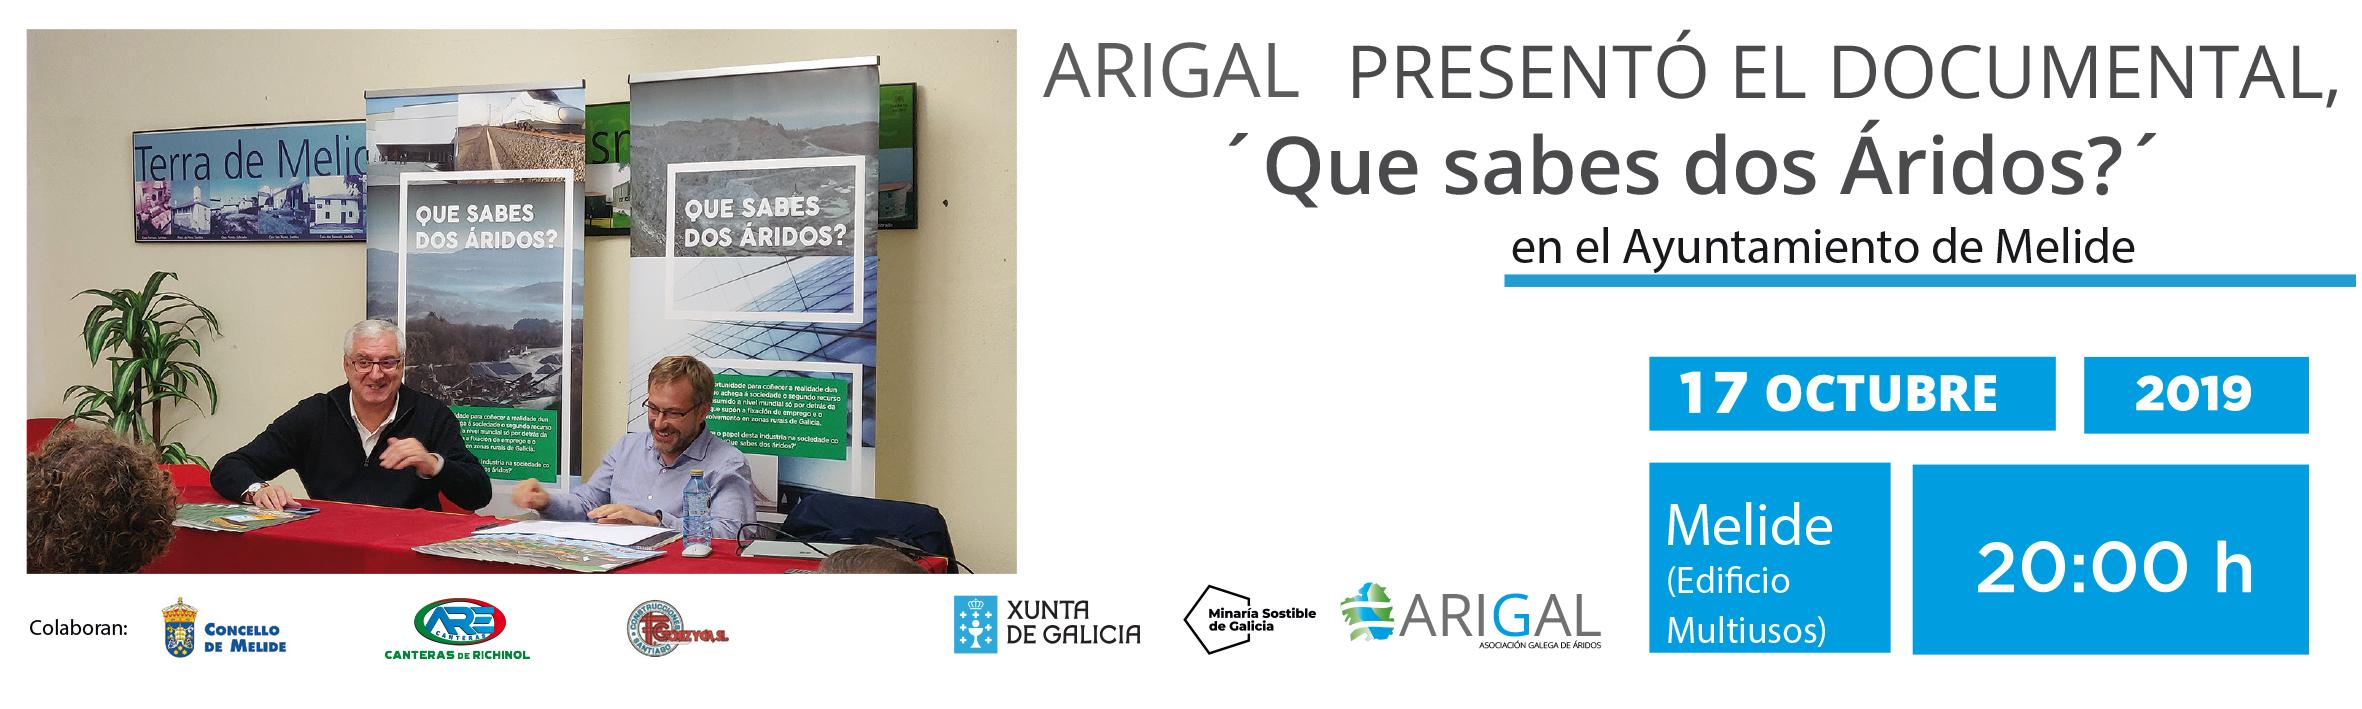 BANNER_Presentacion-Documental-Aridos_ES-20191017